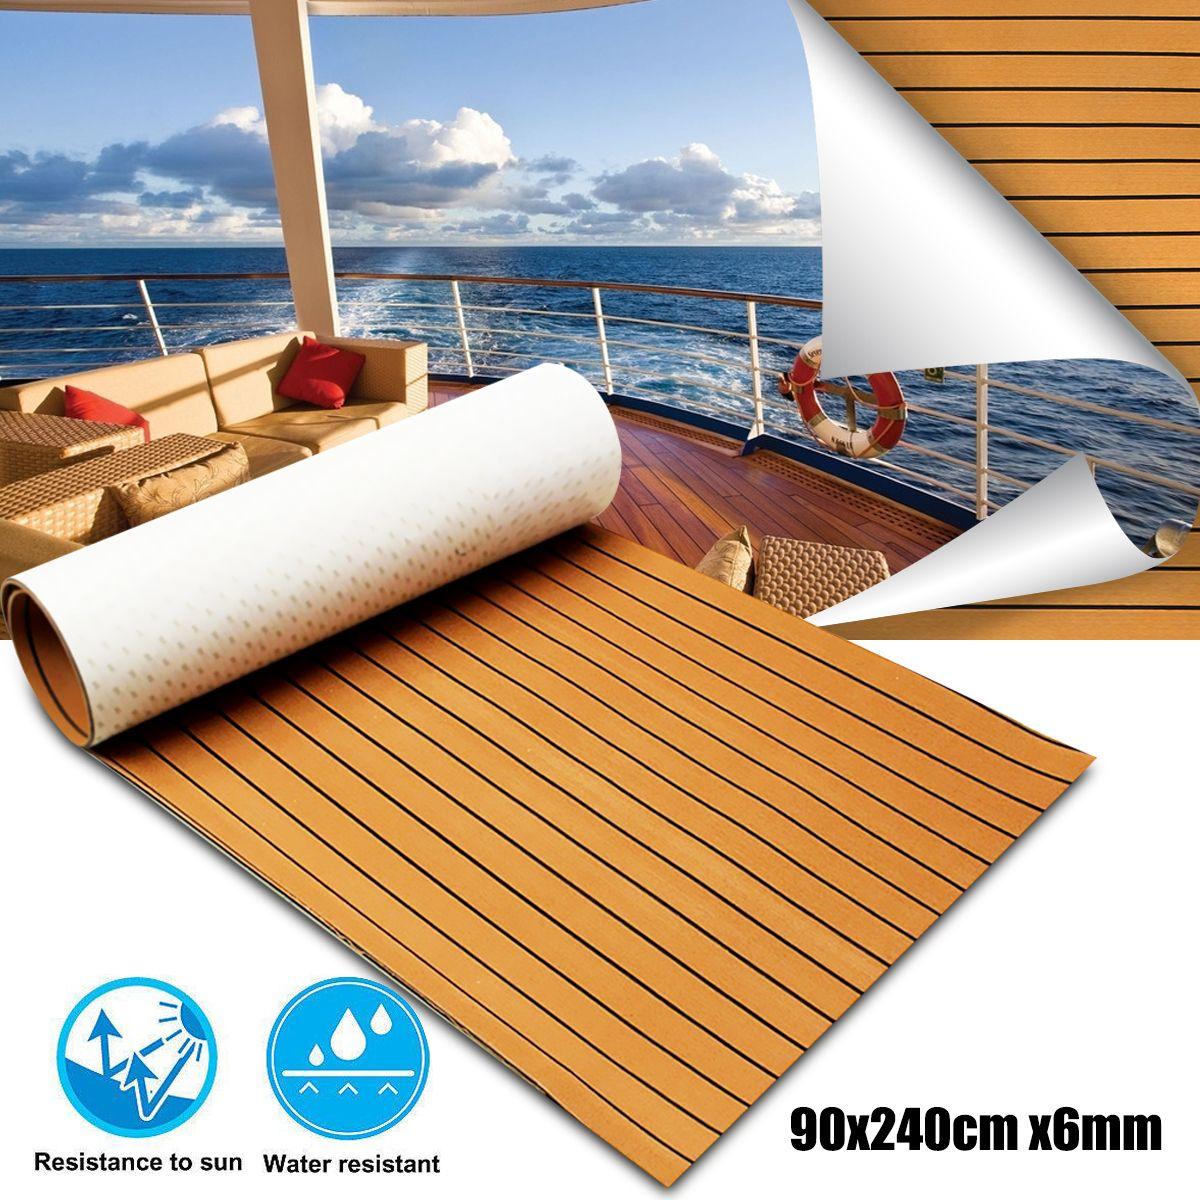 900x2400x6mm Self-Adhesive Gold With Black Lines Marine Flooring Faux Teak EVA Foam Boat Decking Sheet